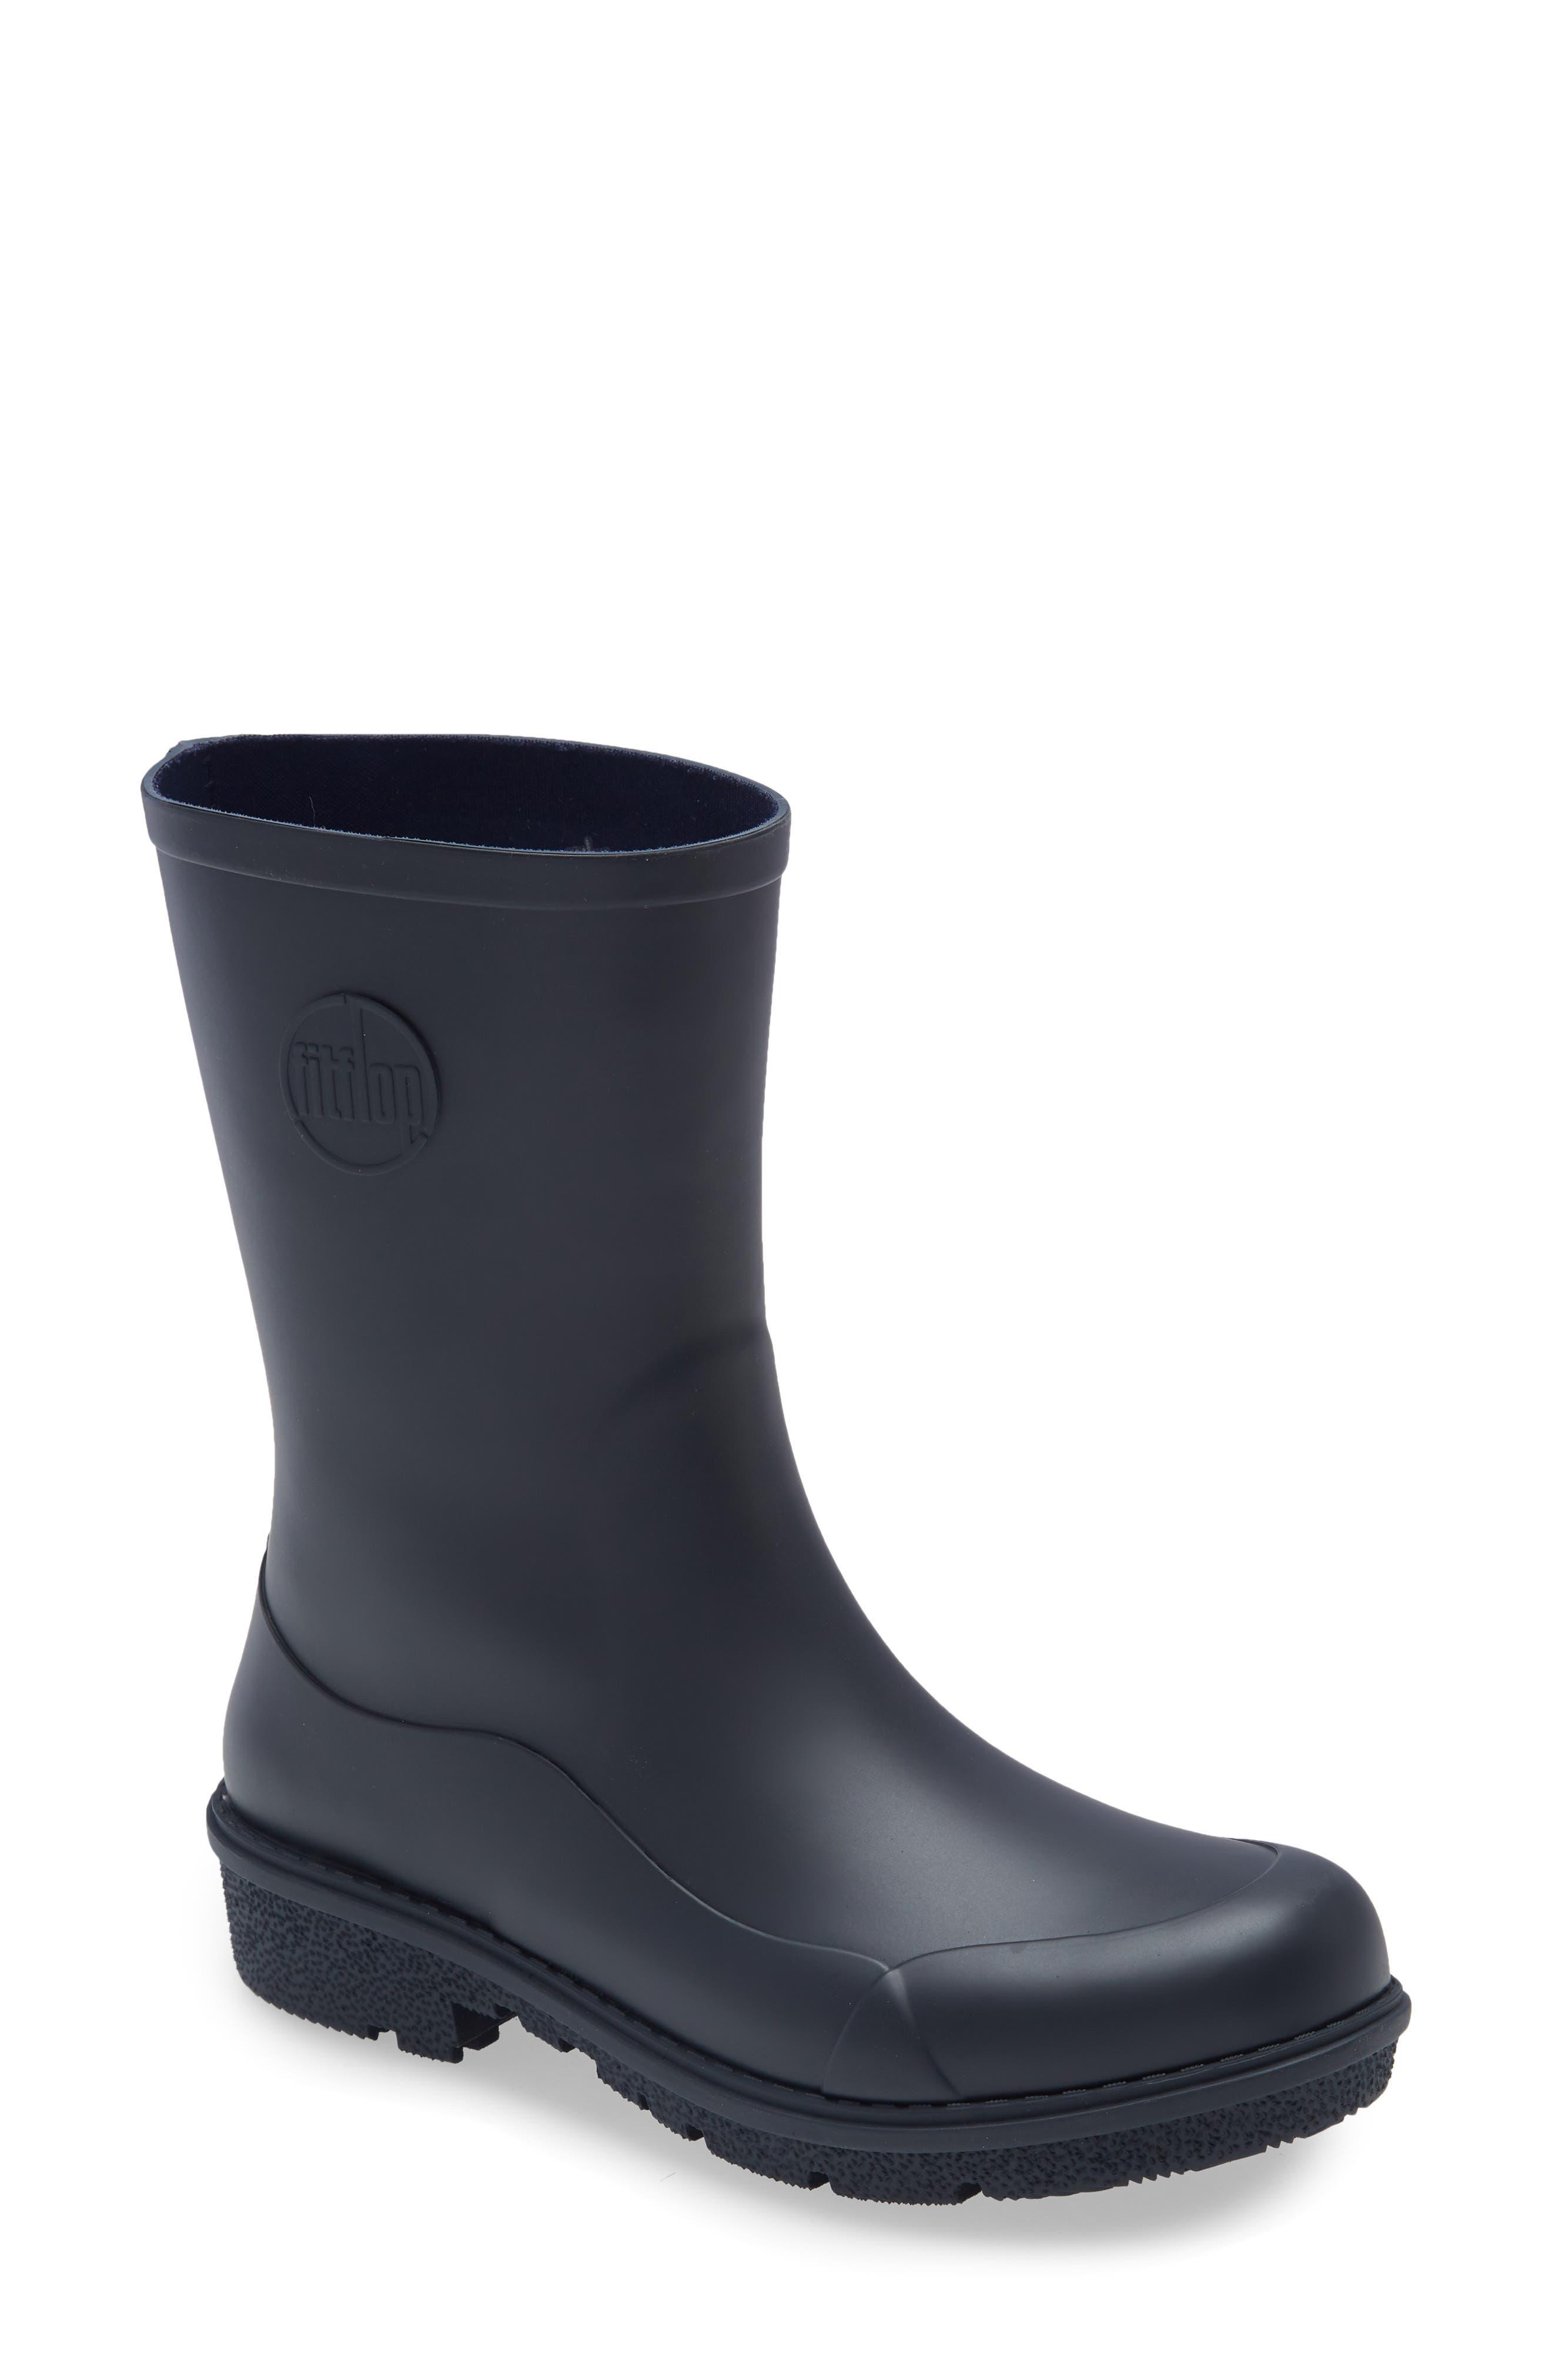 Wonderwelly Rain Boot